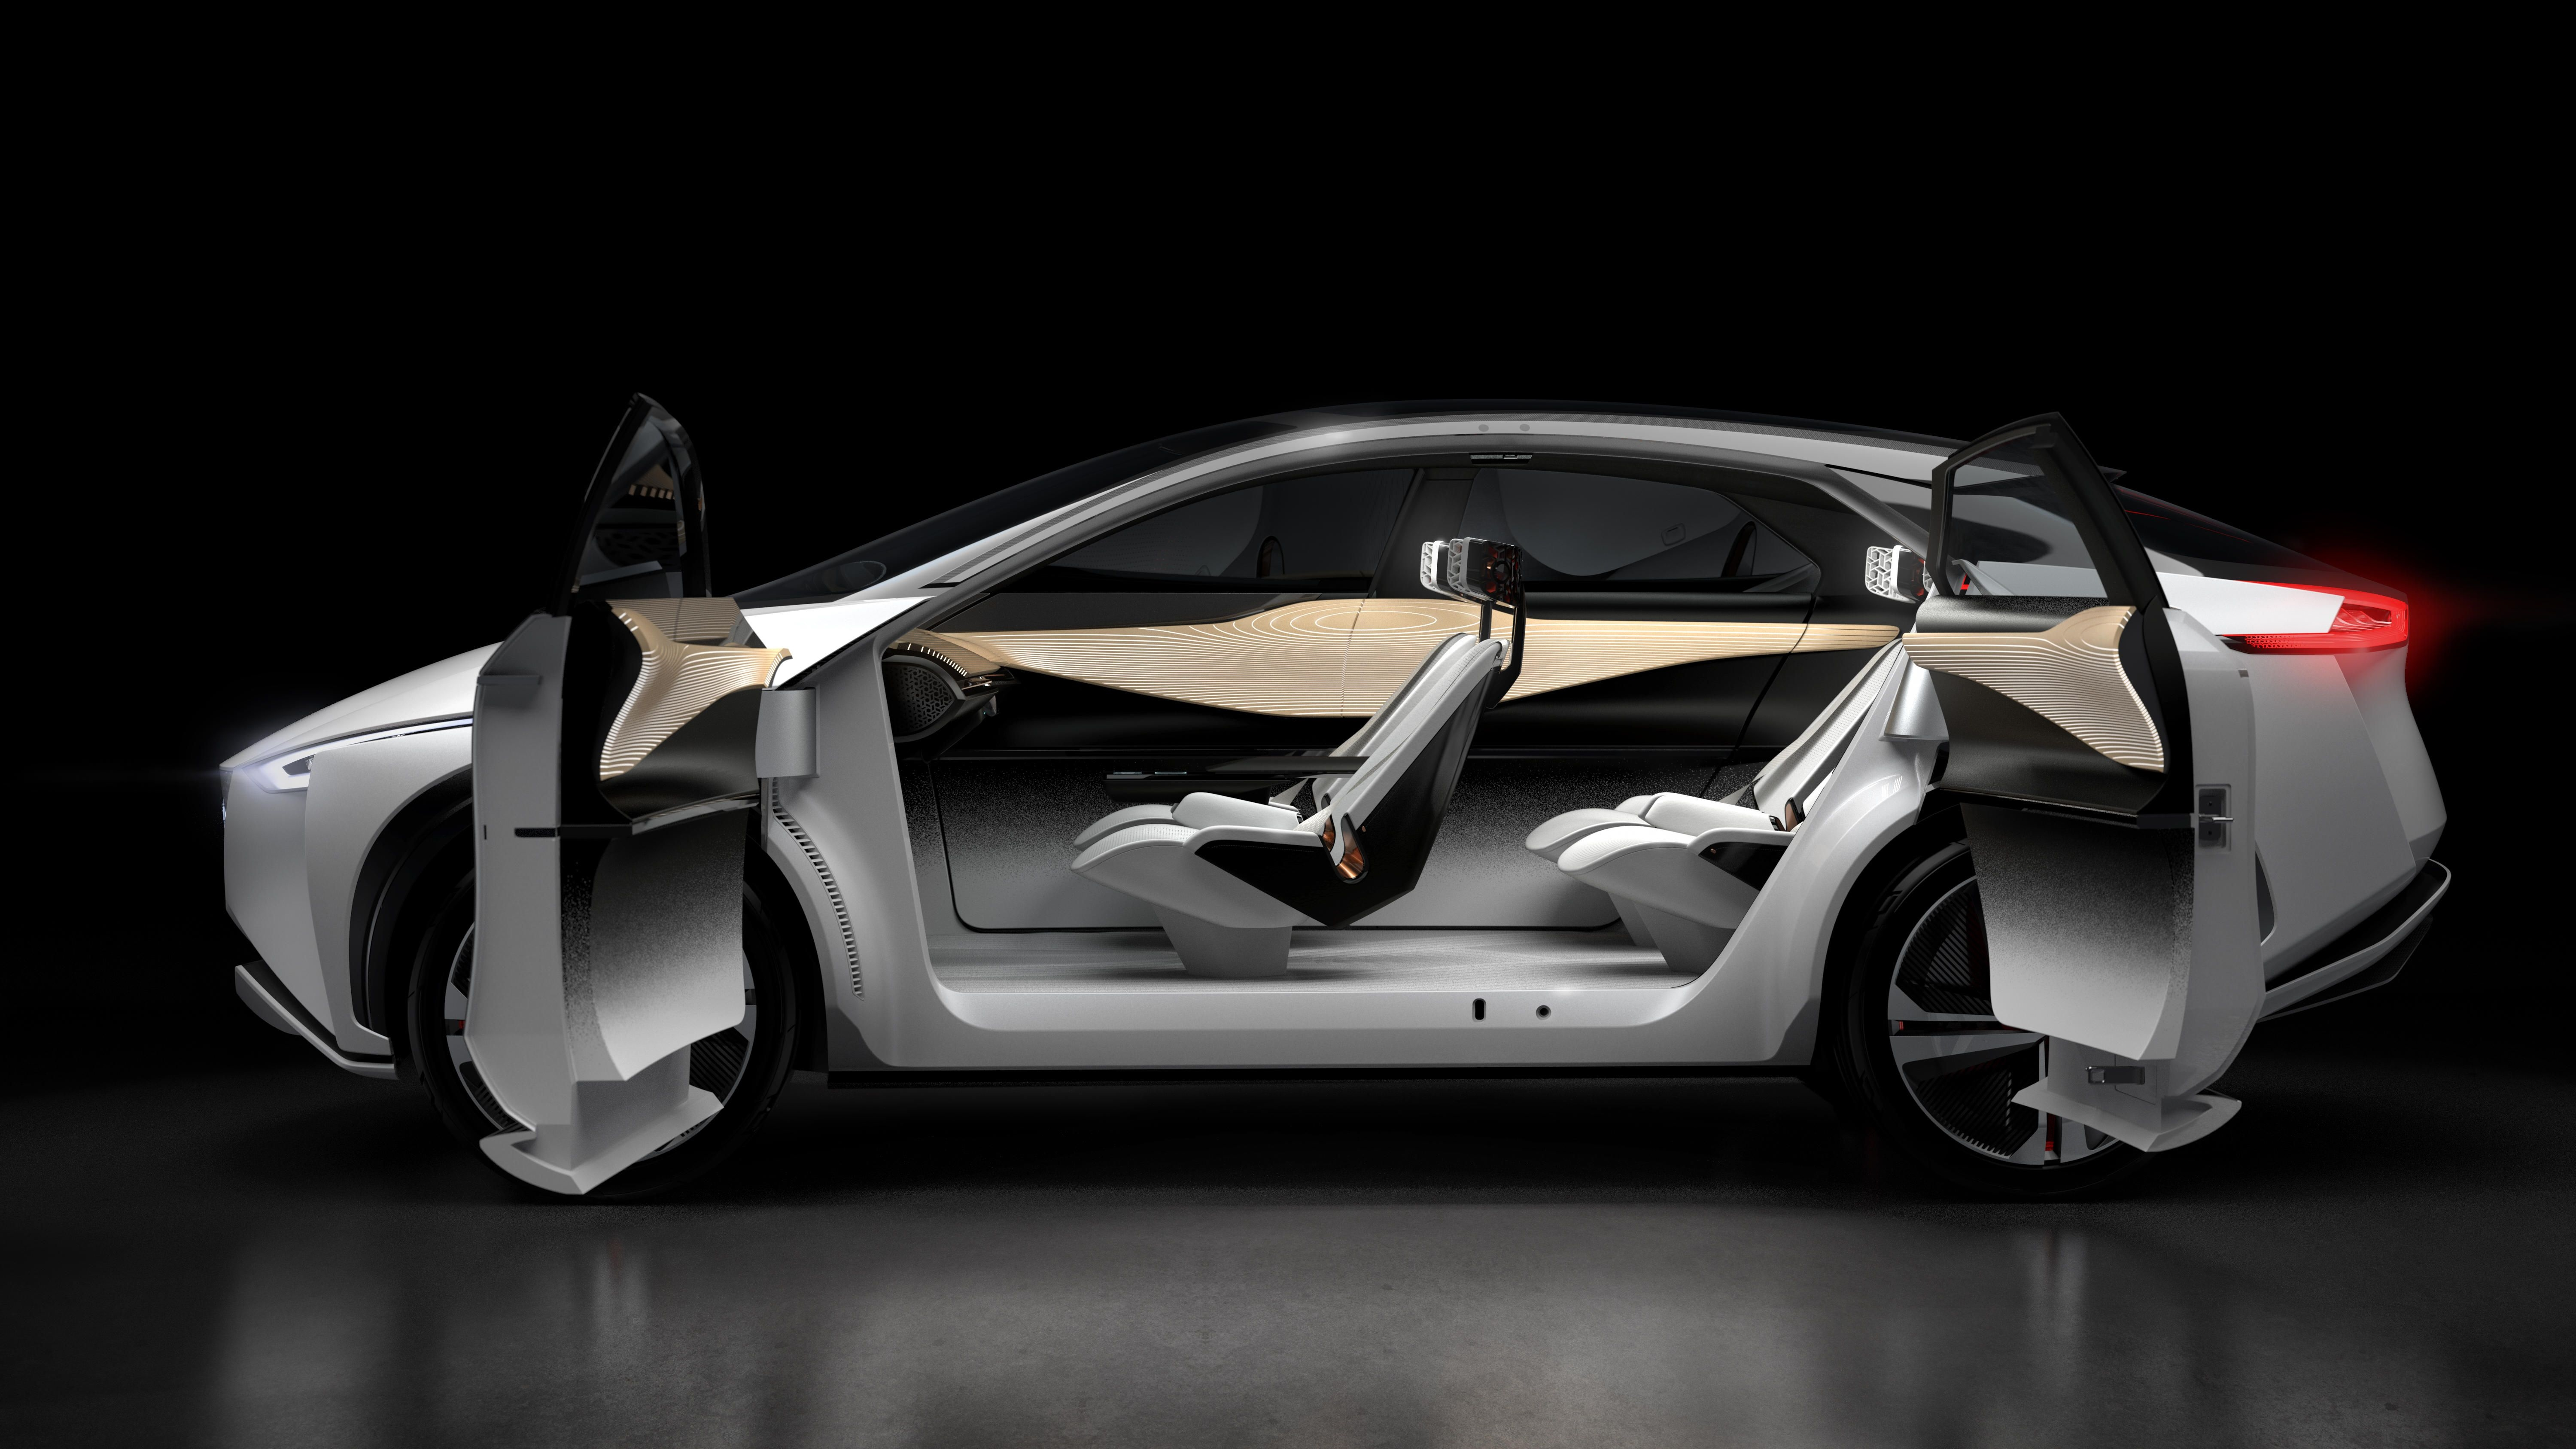 Nissan shares its vision for our autonomous EV future at CES | DeviceDaily.com